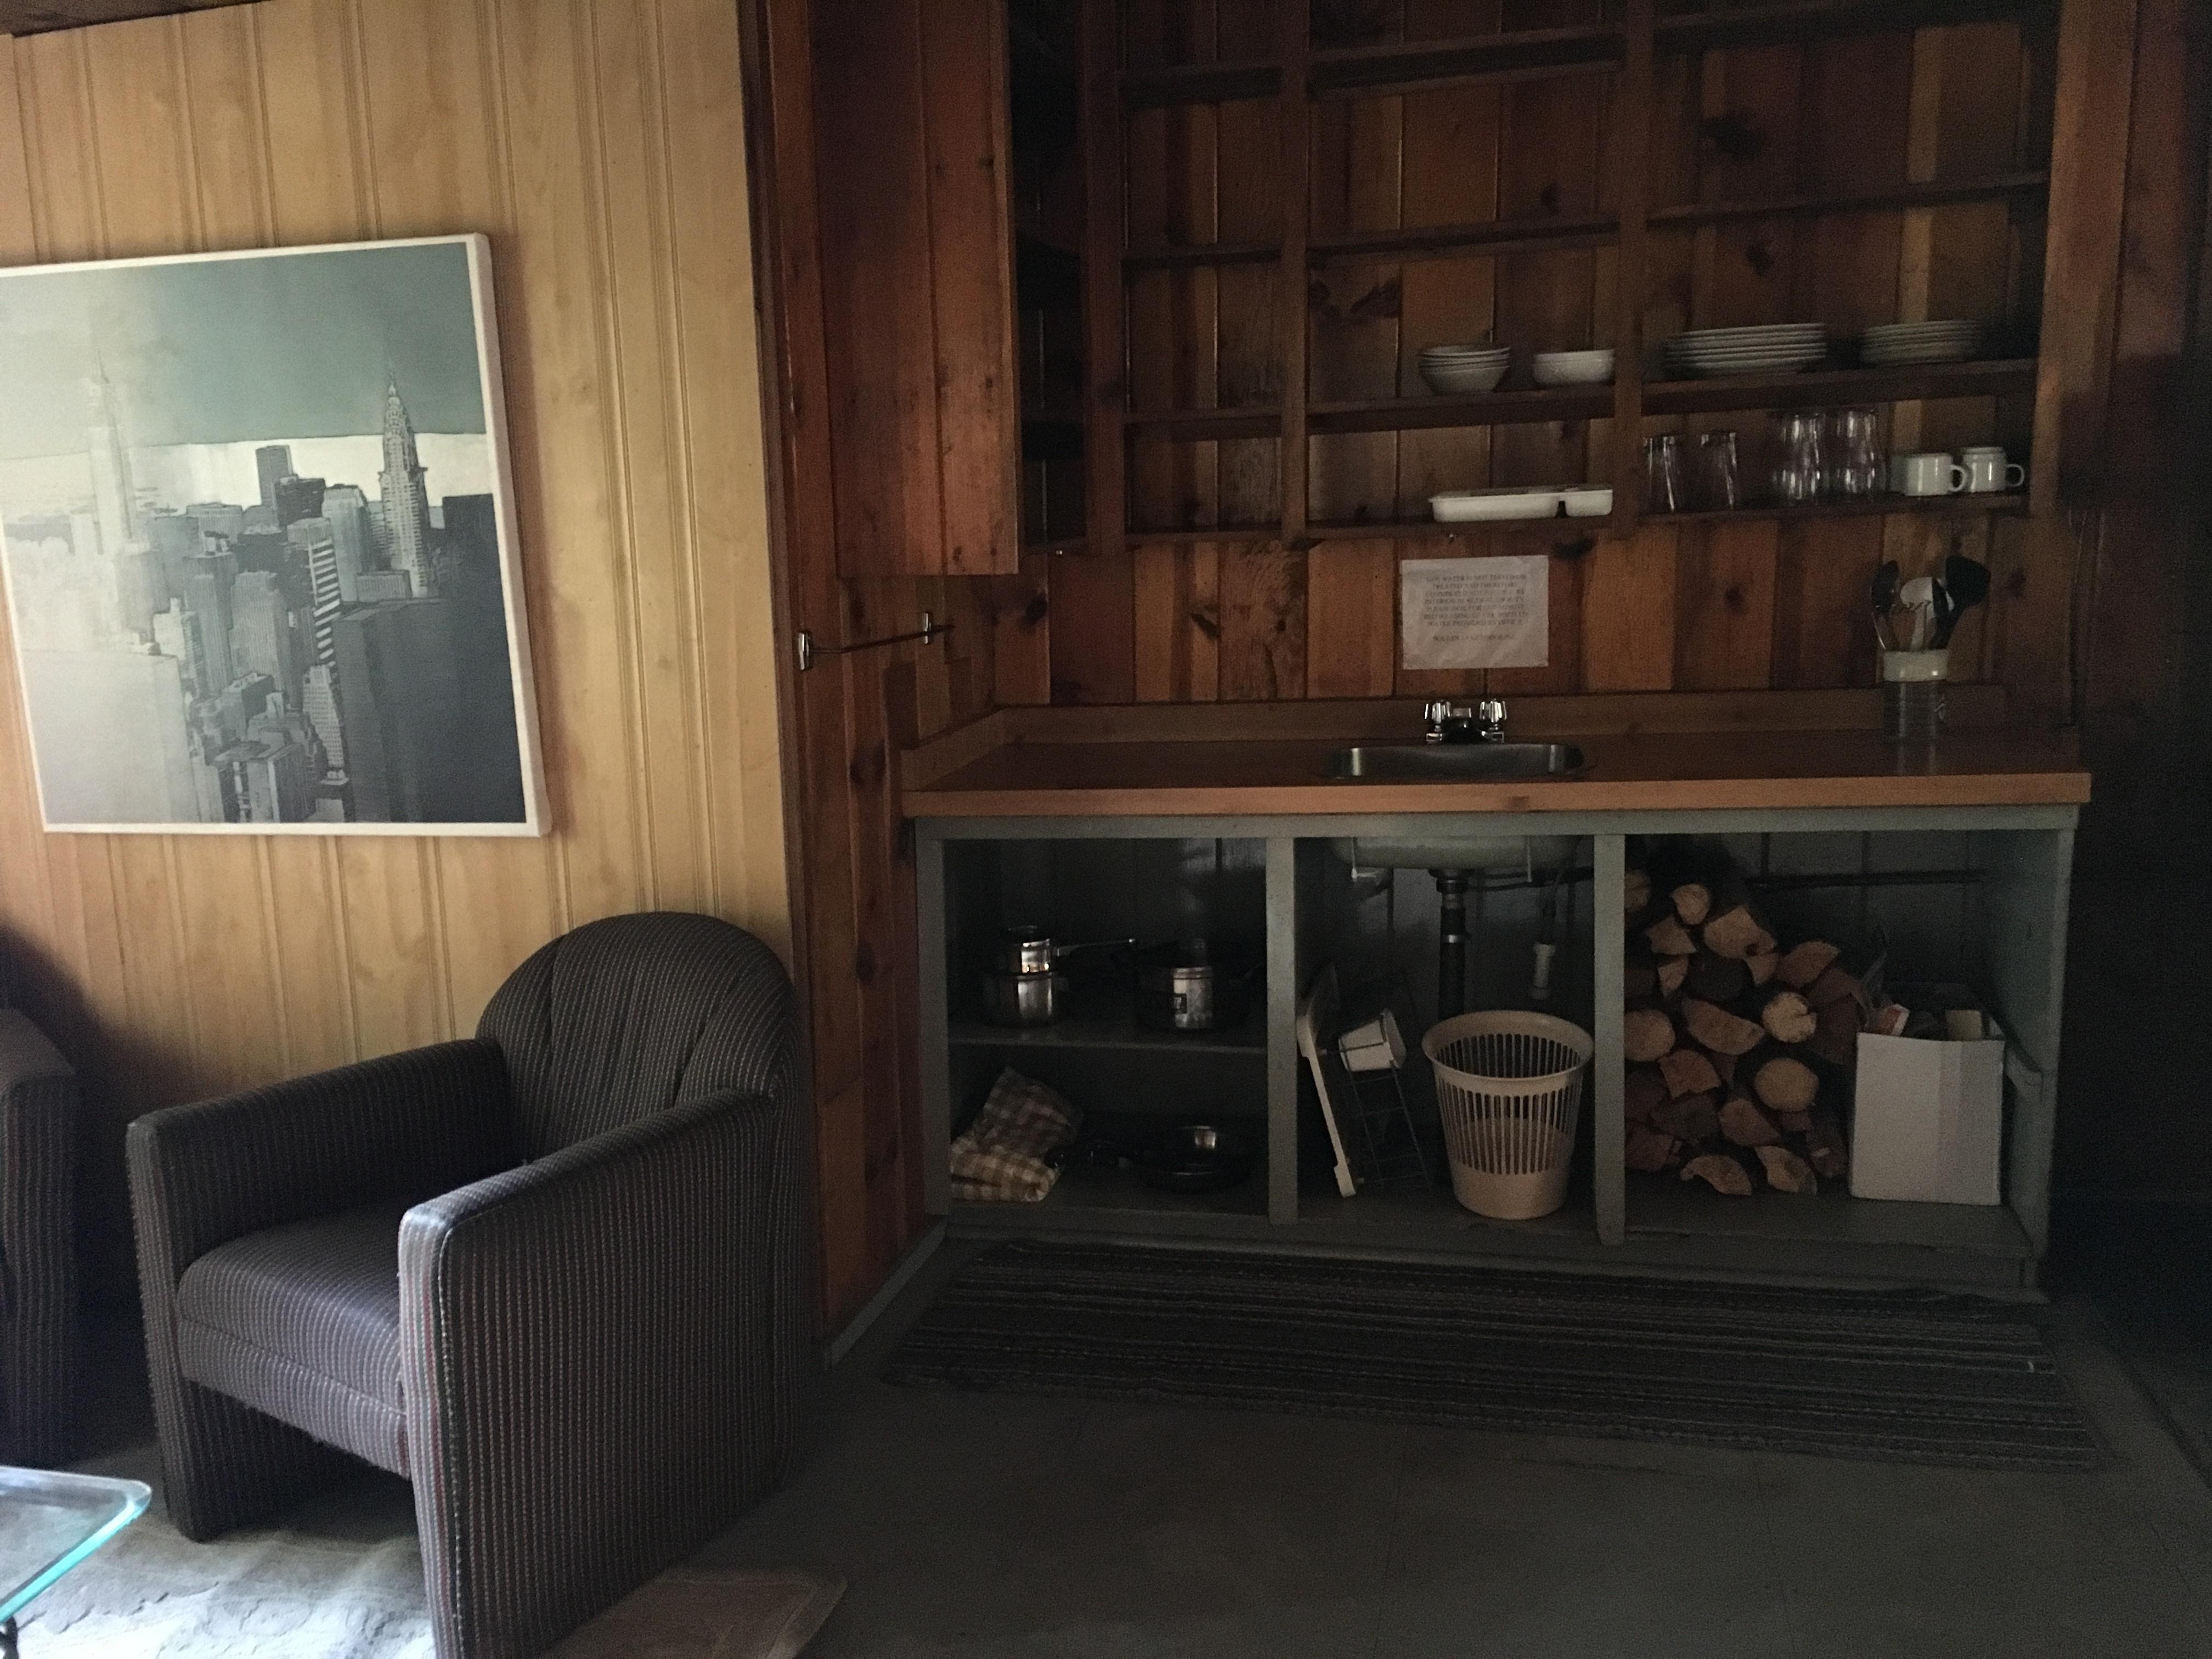 https://0901.nccdn.net/4_2/000/000/010/19b/cabin-9-kitchen-4032x3024.jpg